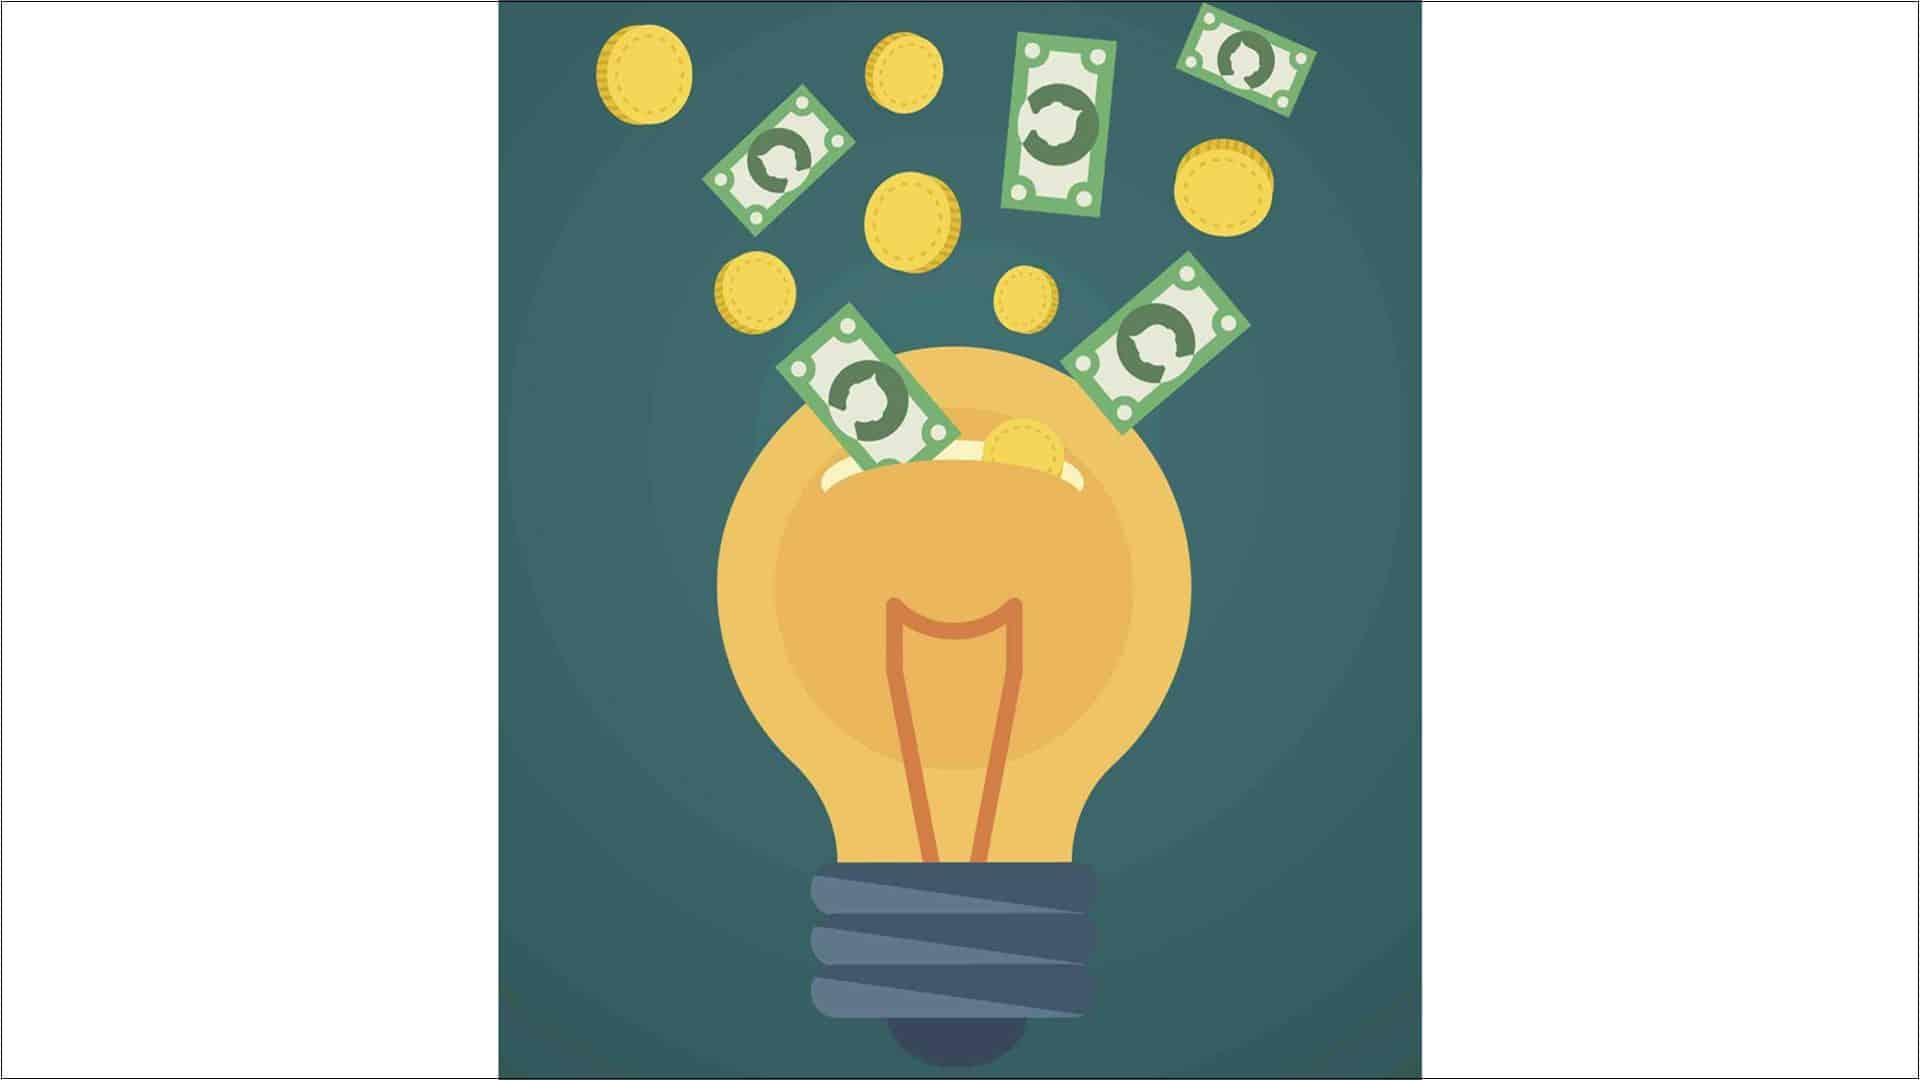 TartanSense raises USD 5 mn from FMC, Omnivore and Blume Ventures